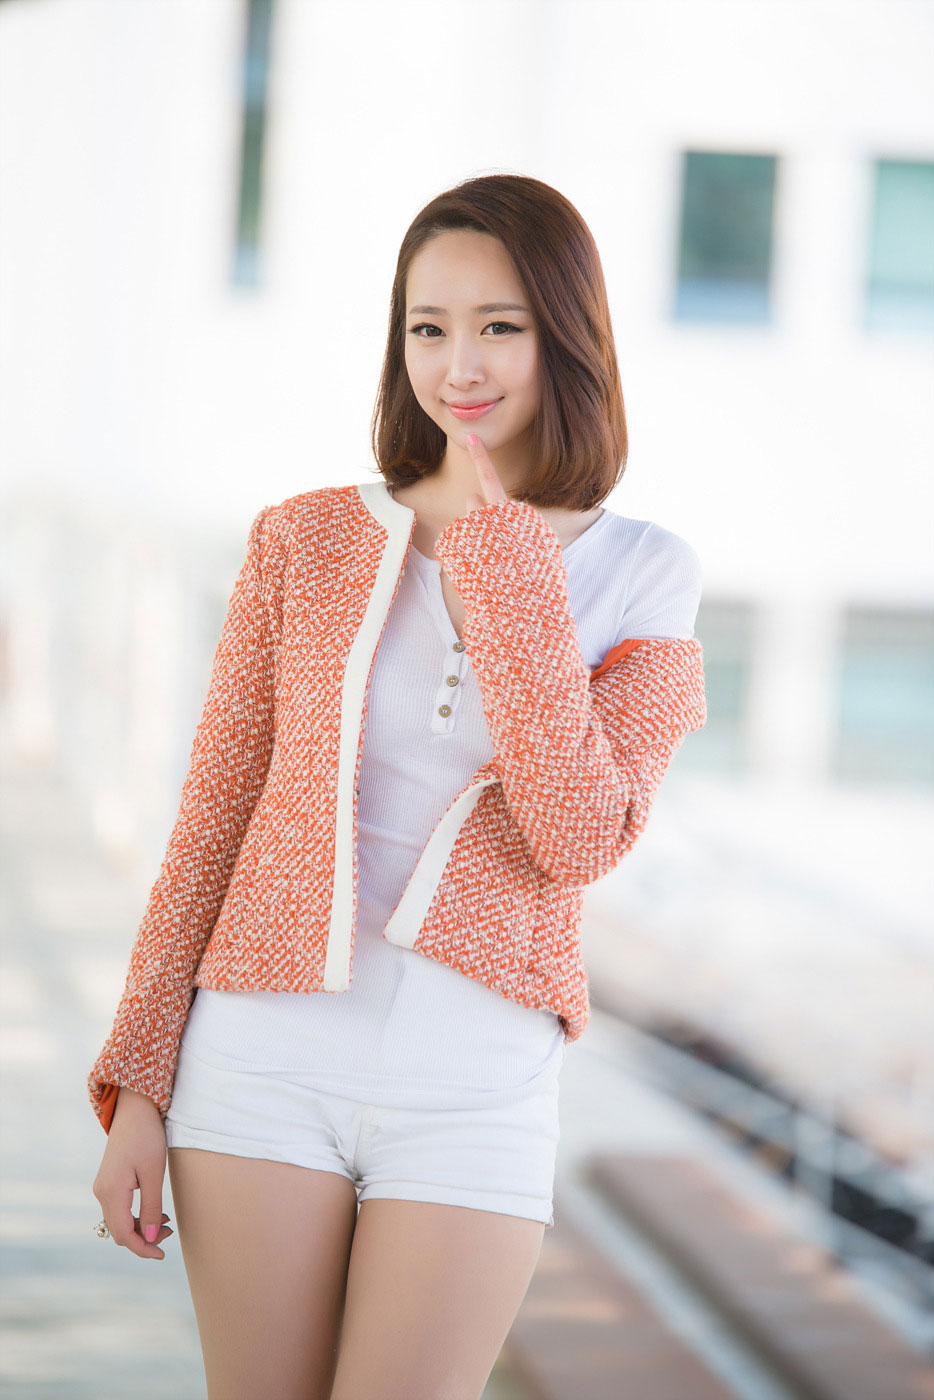 Korean model Shin Haeri